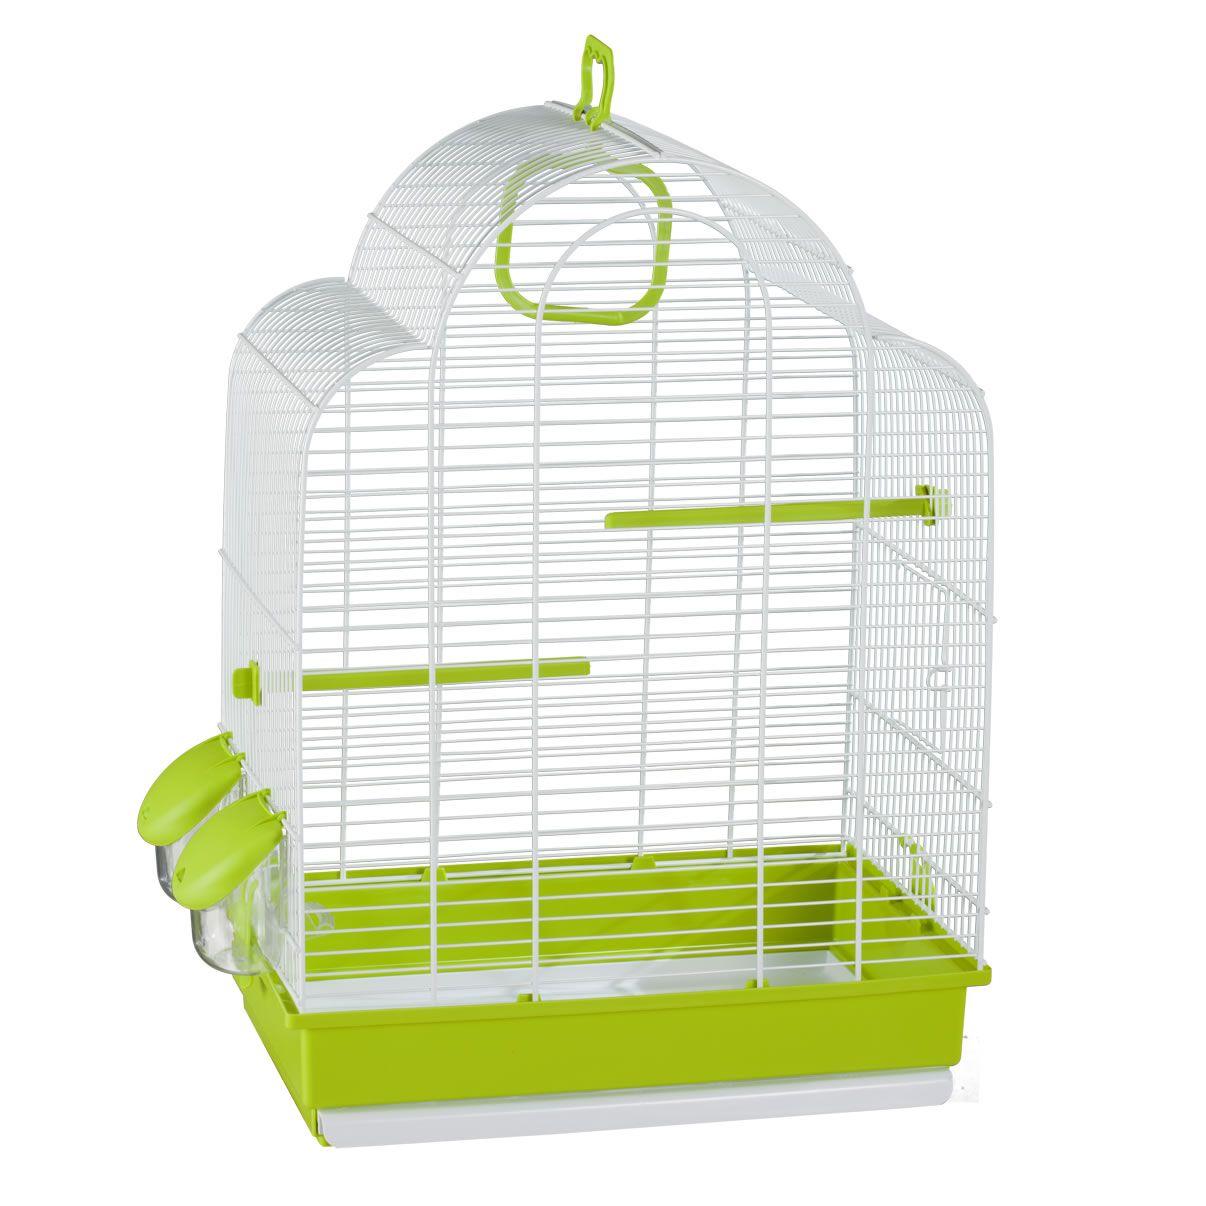 buy bird cages online 2 | Bird cages | Pinterest | Bird cages and Bird